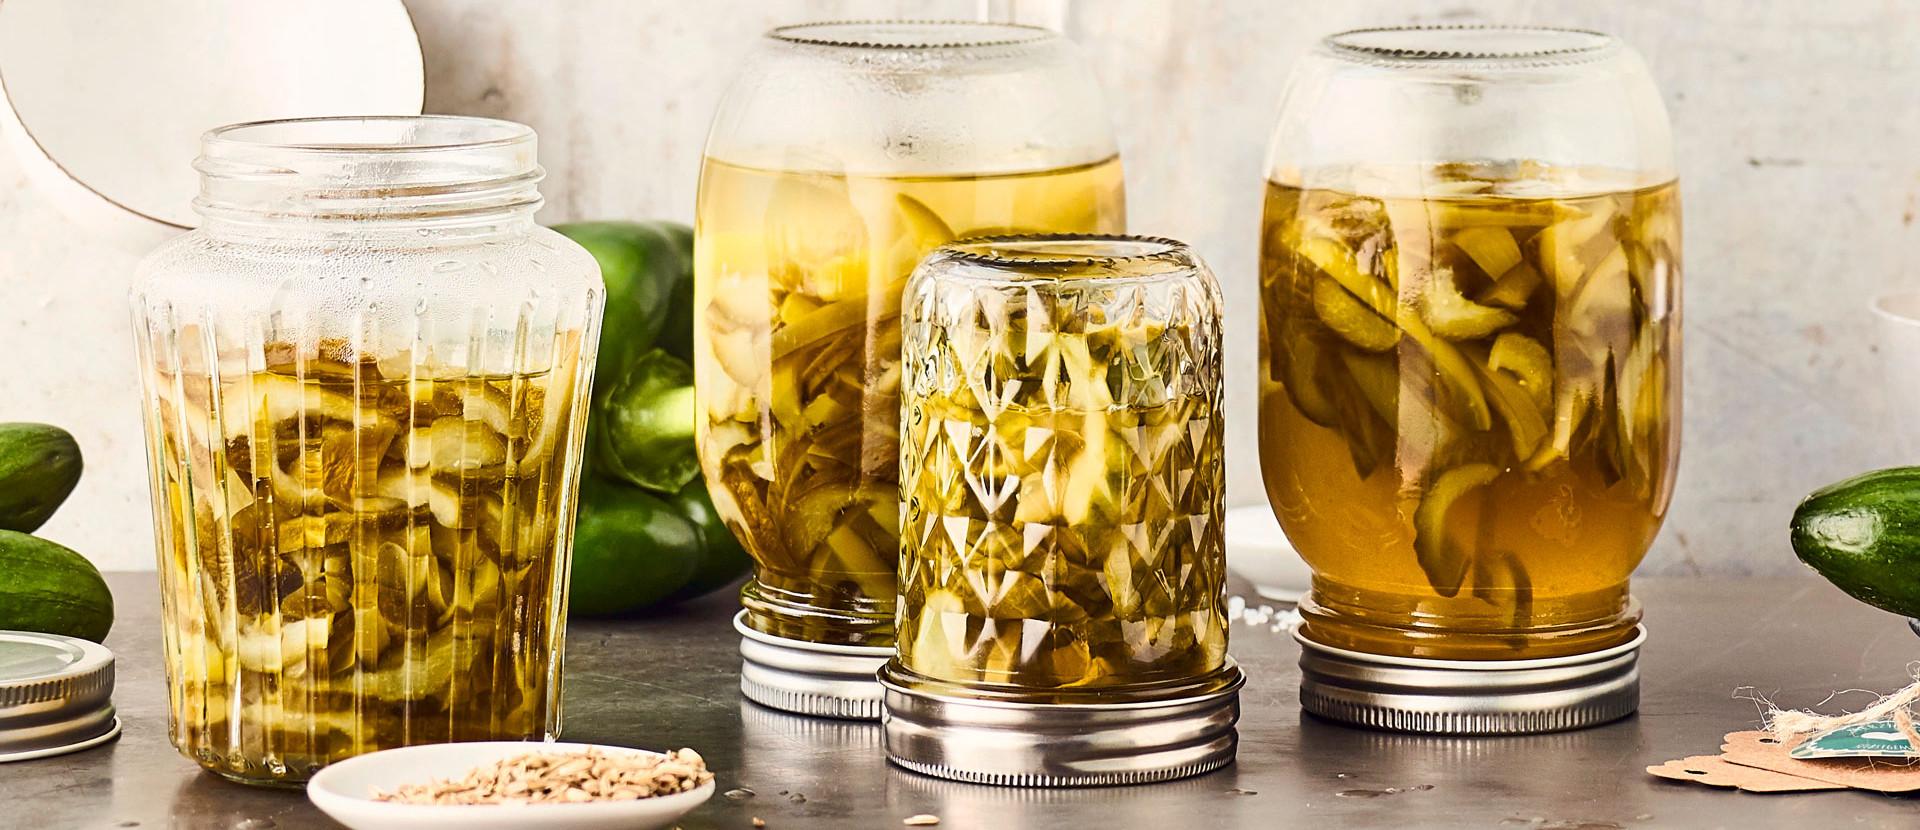 Grüne Sandwich-Pickles